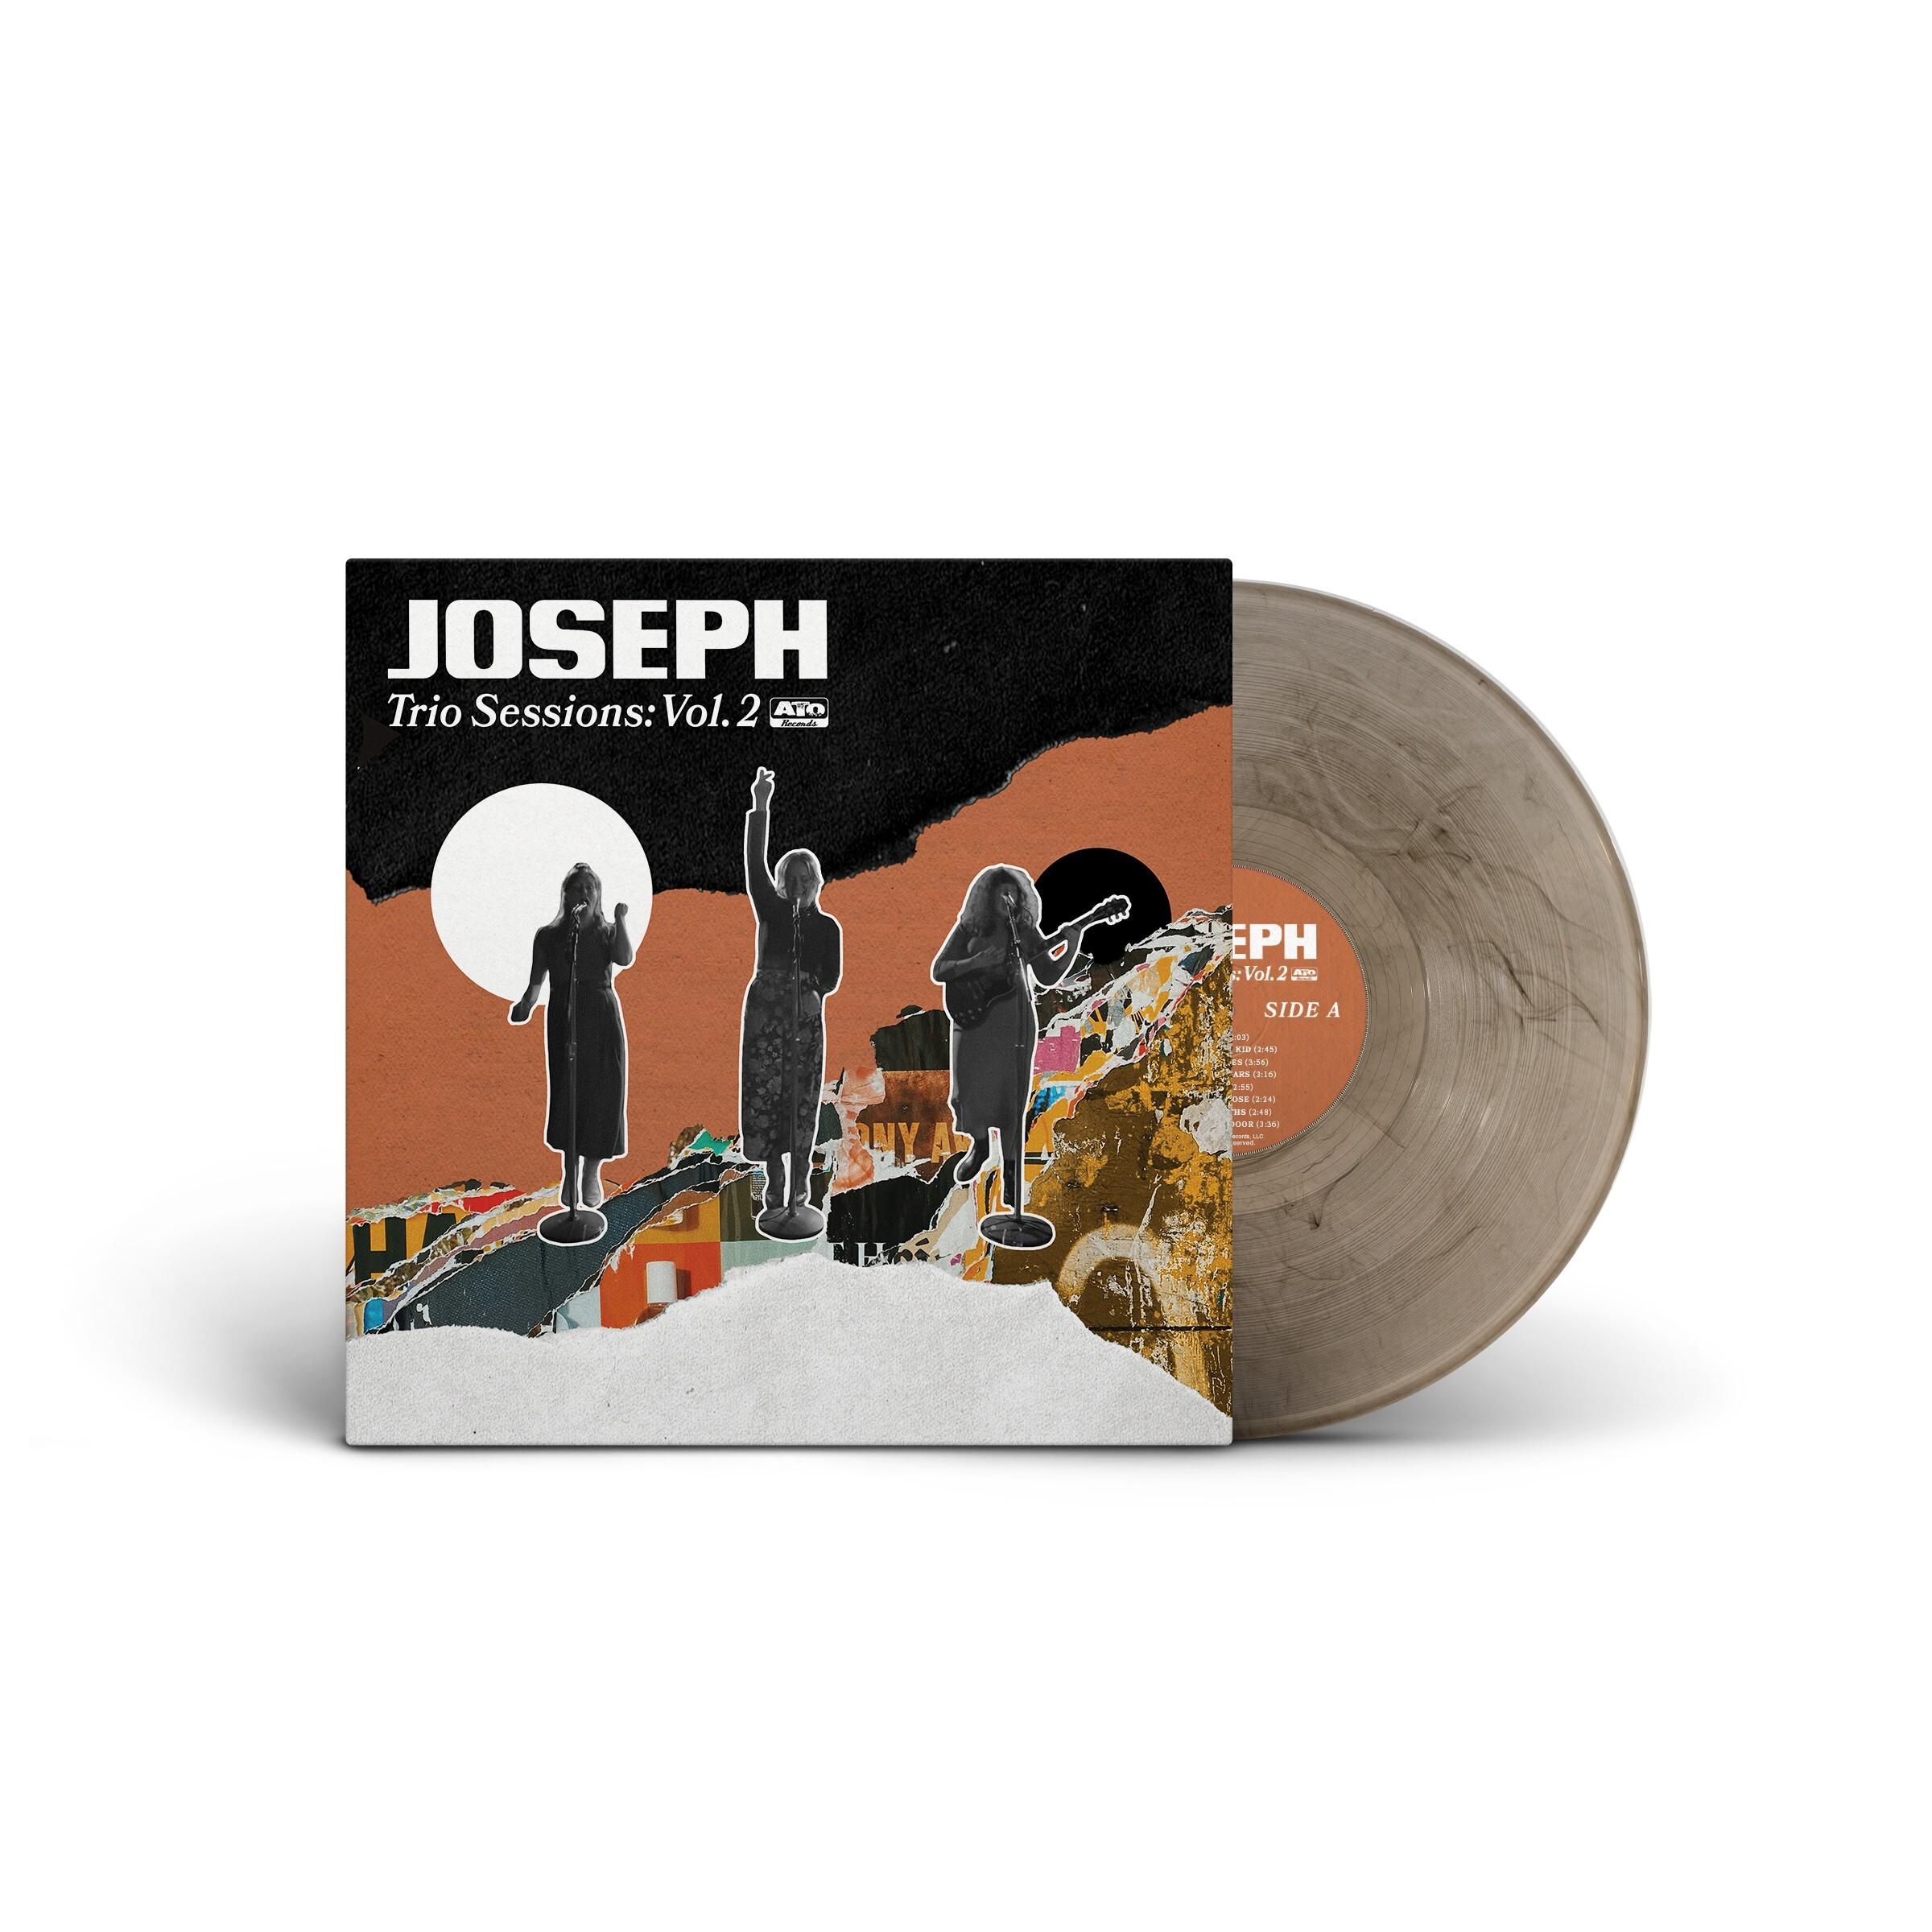 Joseph – Trio Sessions Vol. 2 (Clear Smoke Vinyl)